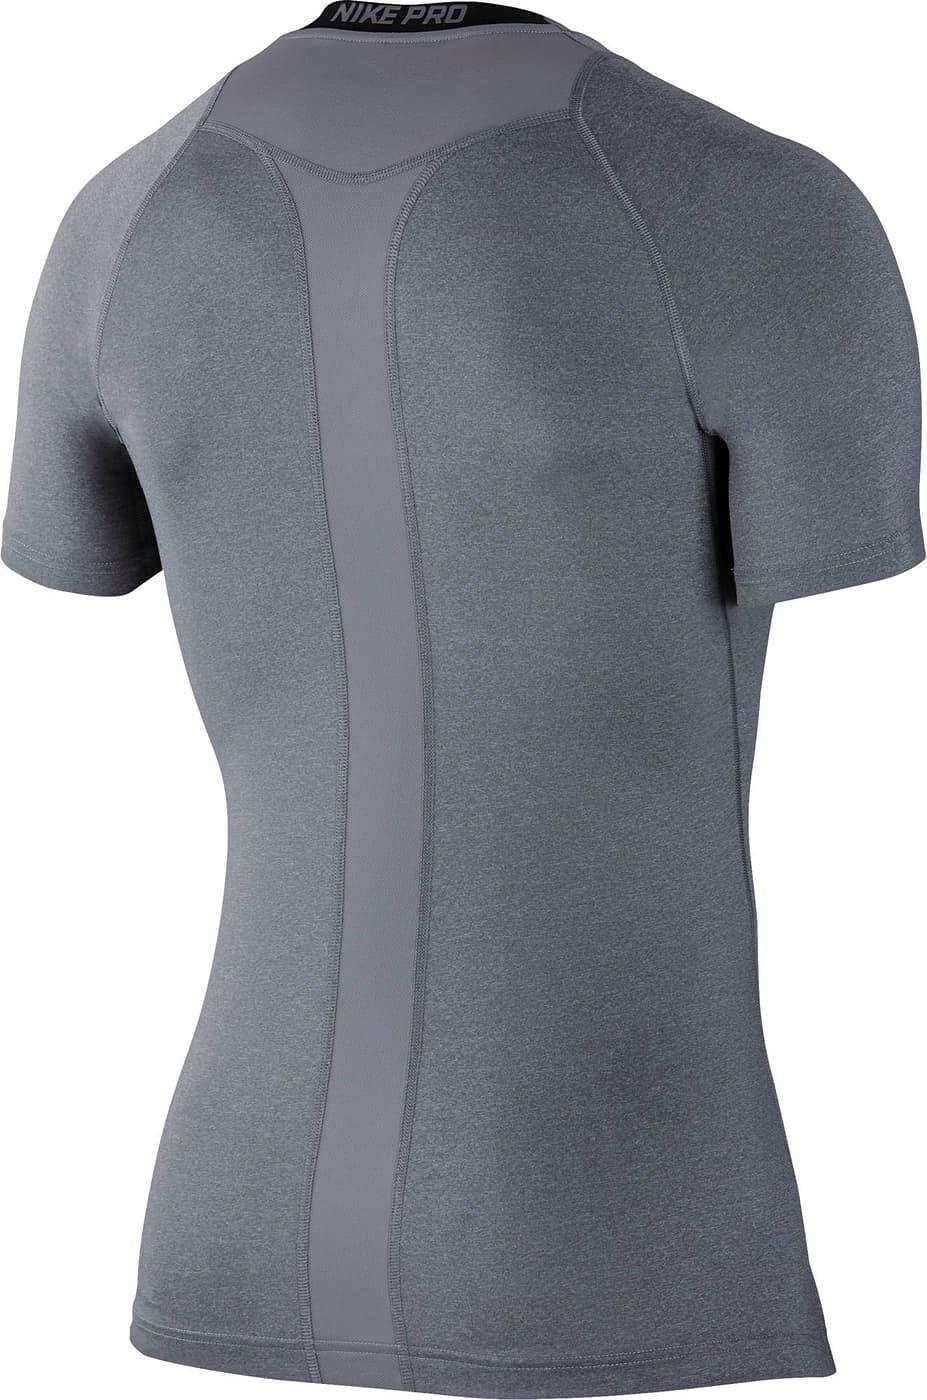 3b84c9909b24 Nike Pro Compression Short-Sleeve Shirt Shirt de football pour homme ...